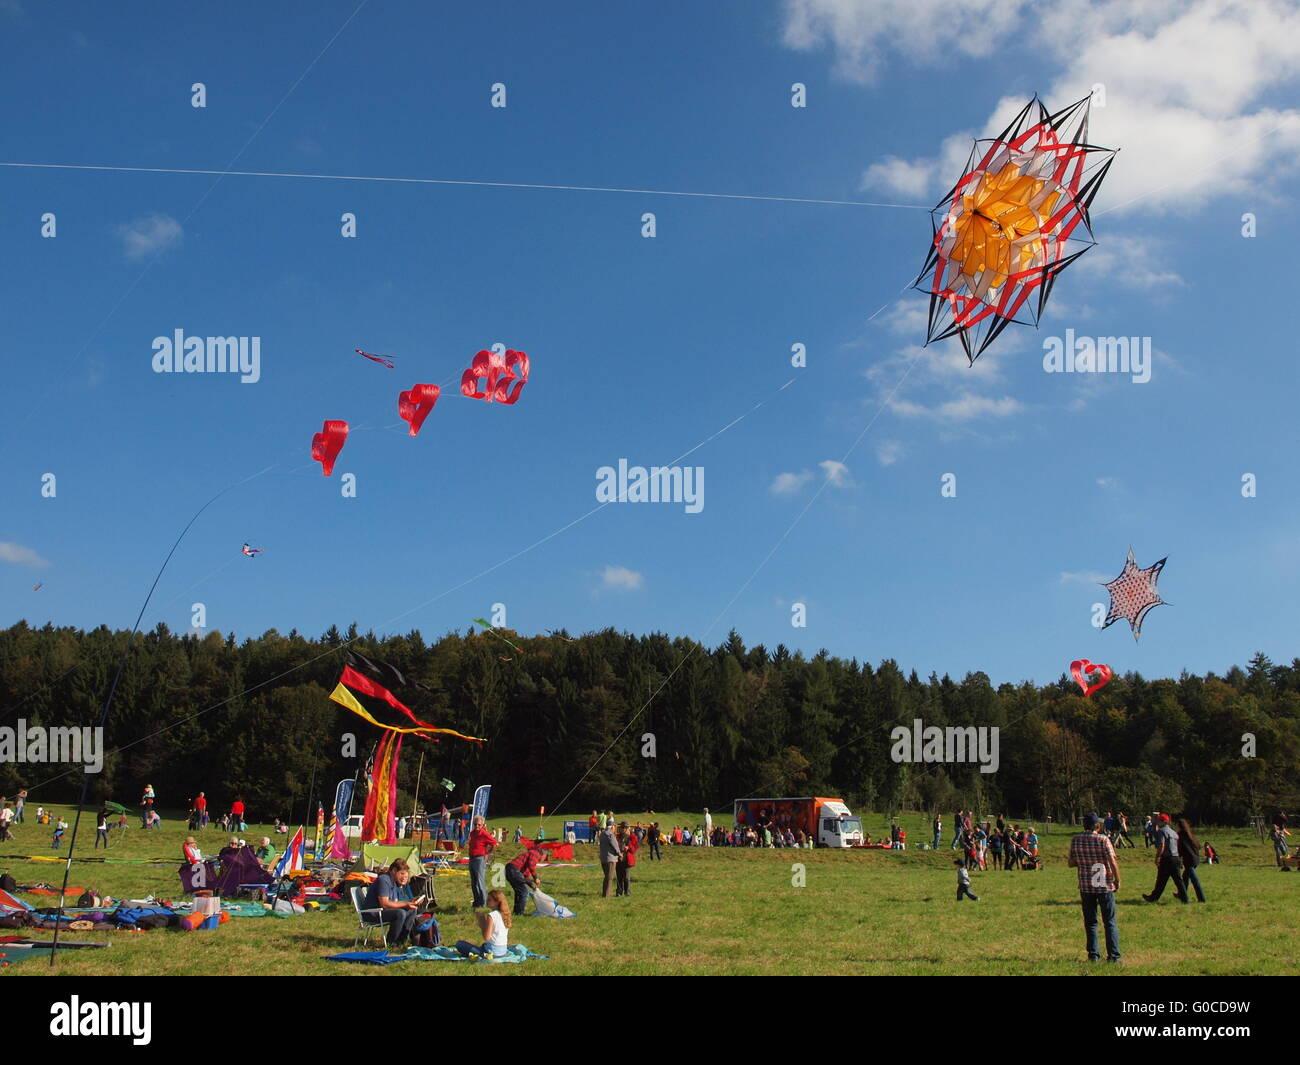 Dragon festival, kite festival - Stock Image